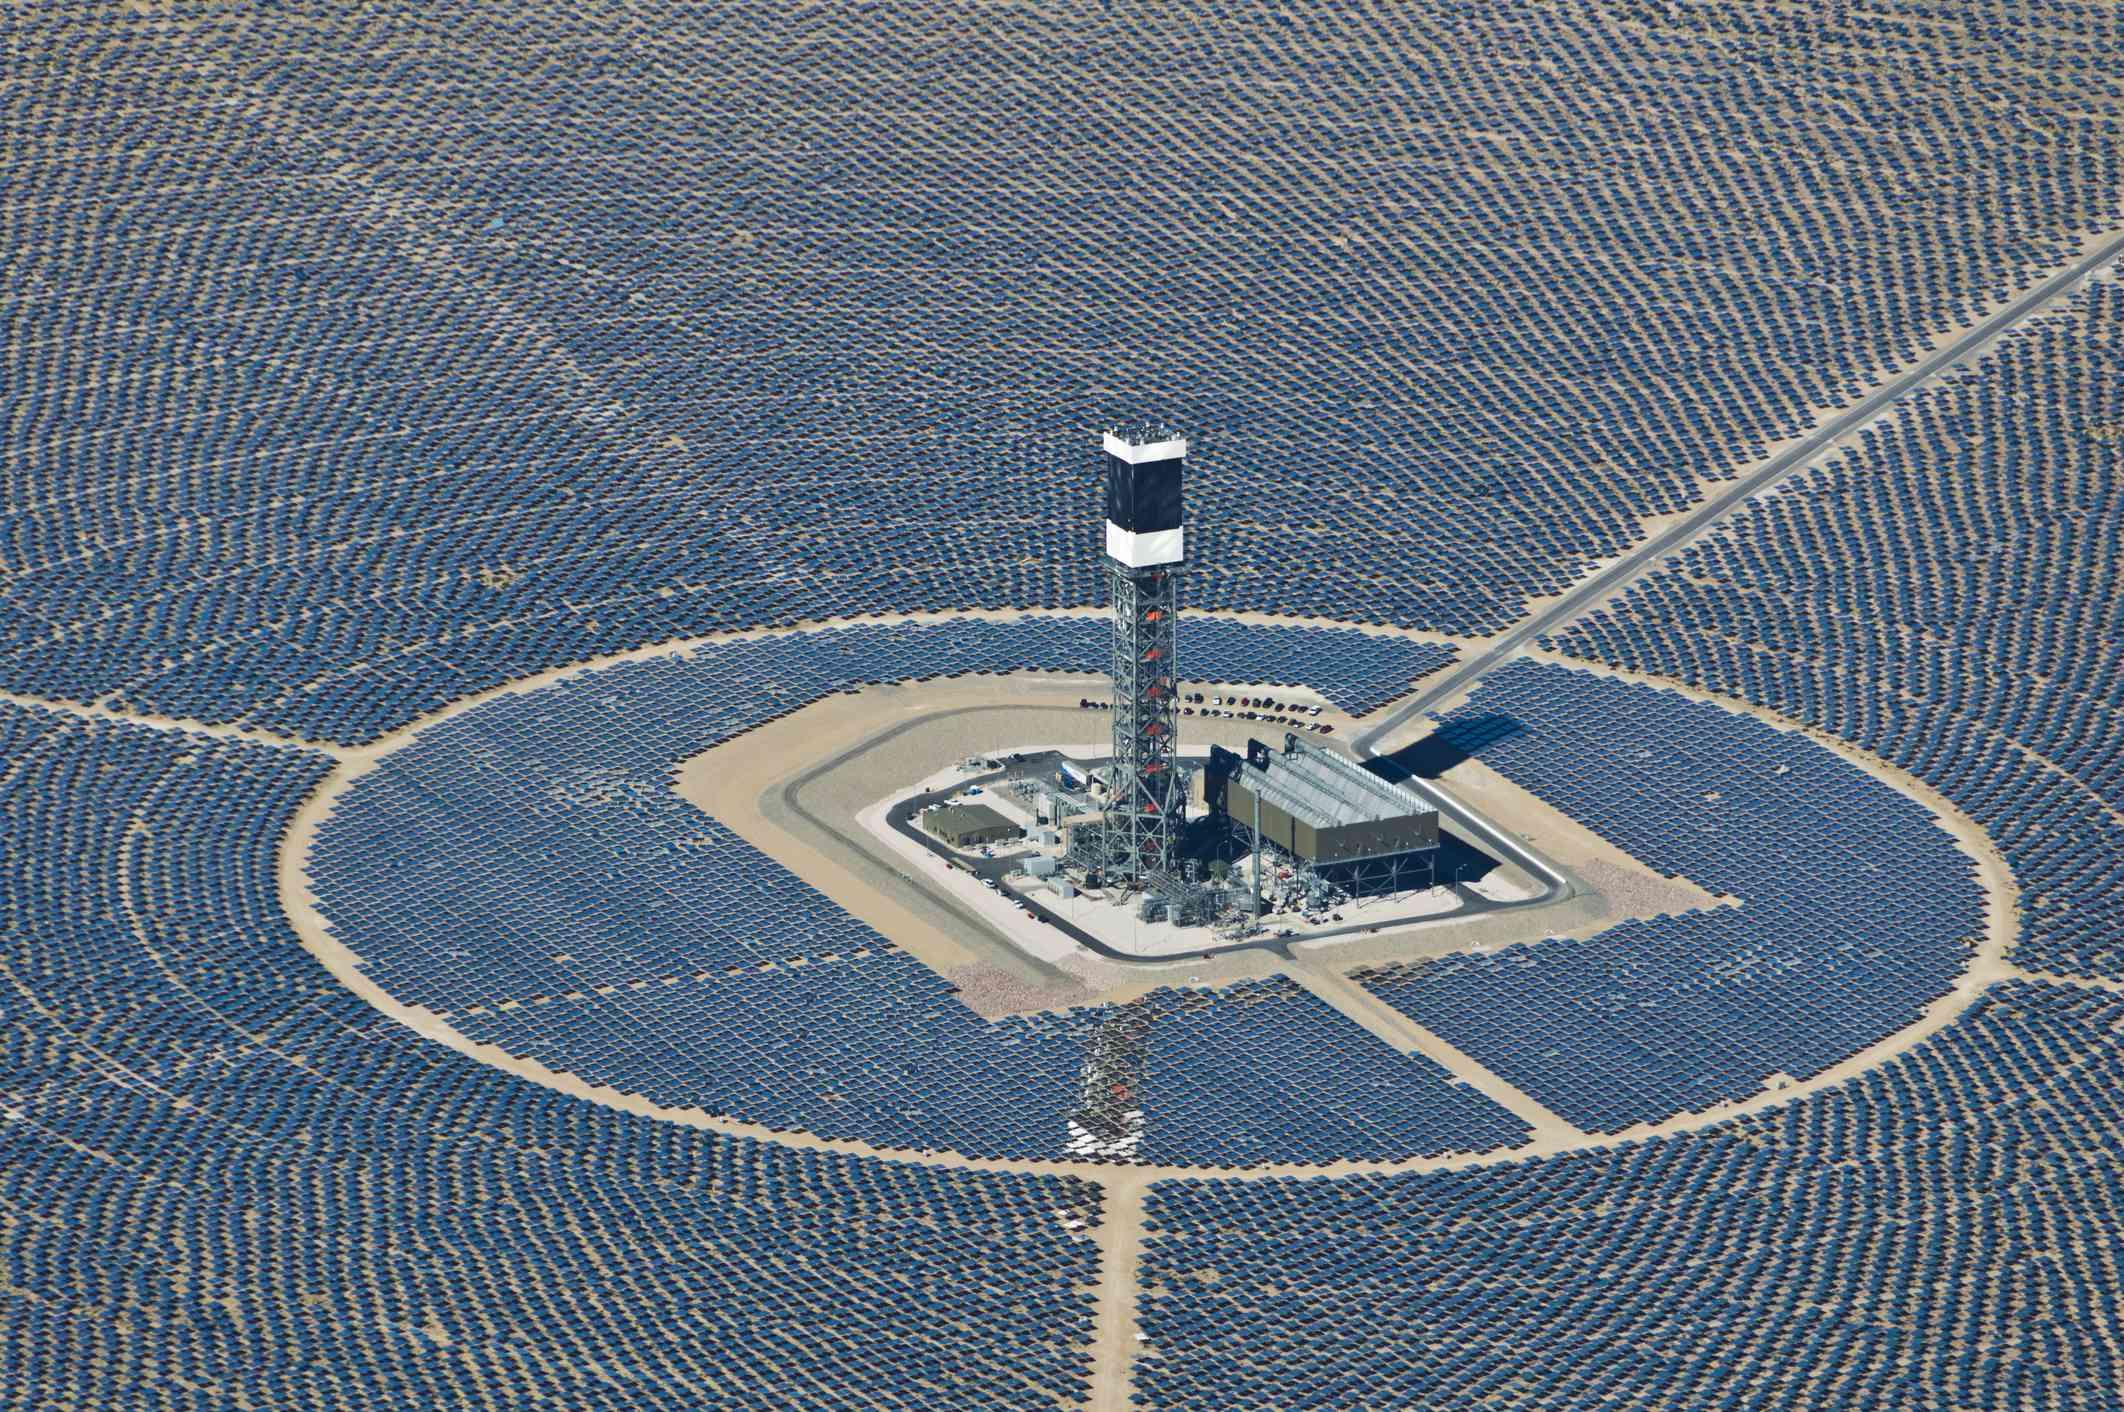 Ivanpah Solar Electric Generating System